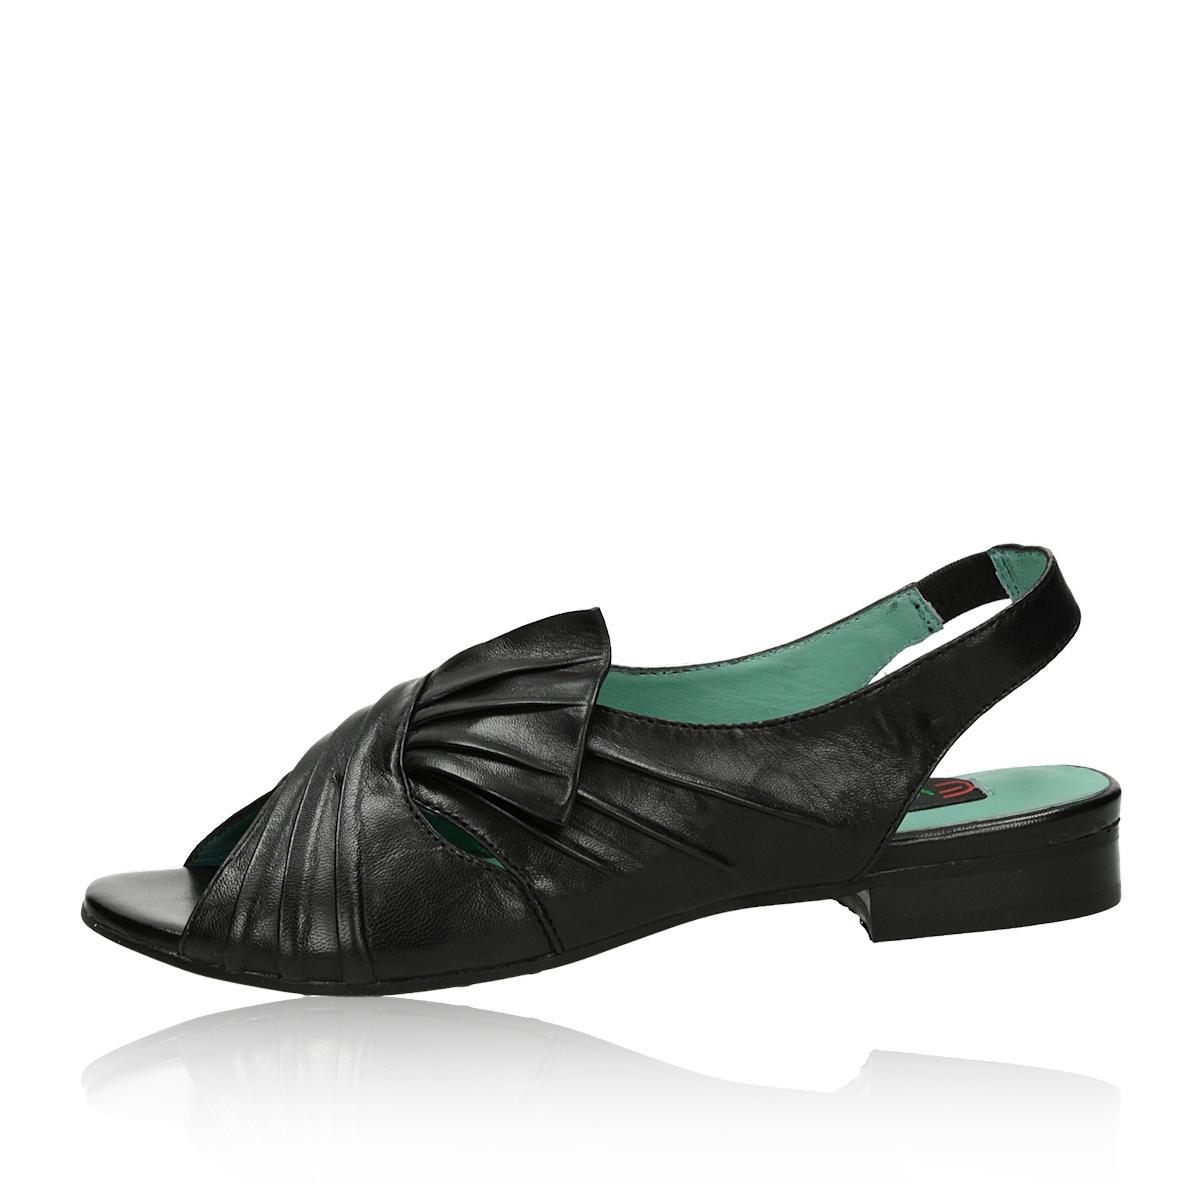 c71320068723 ... Everybody dámske pohodlné kožené sandále - čierne ...